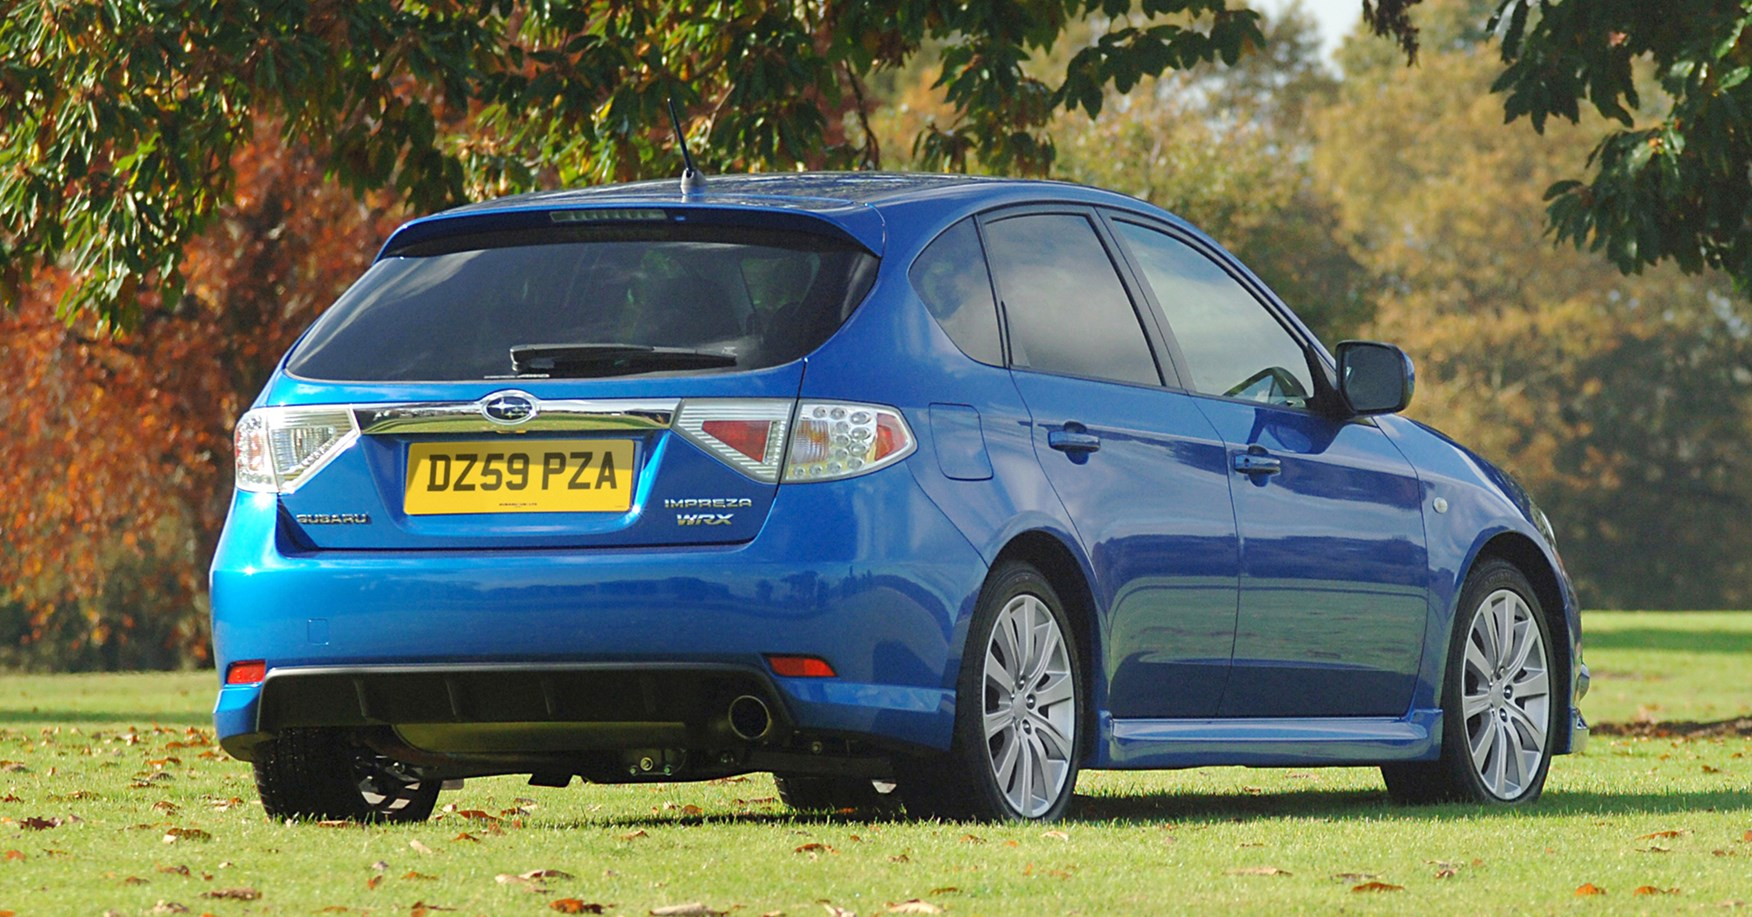 Subaru Impreza Hatchback Review 2007 2012 Parkers